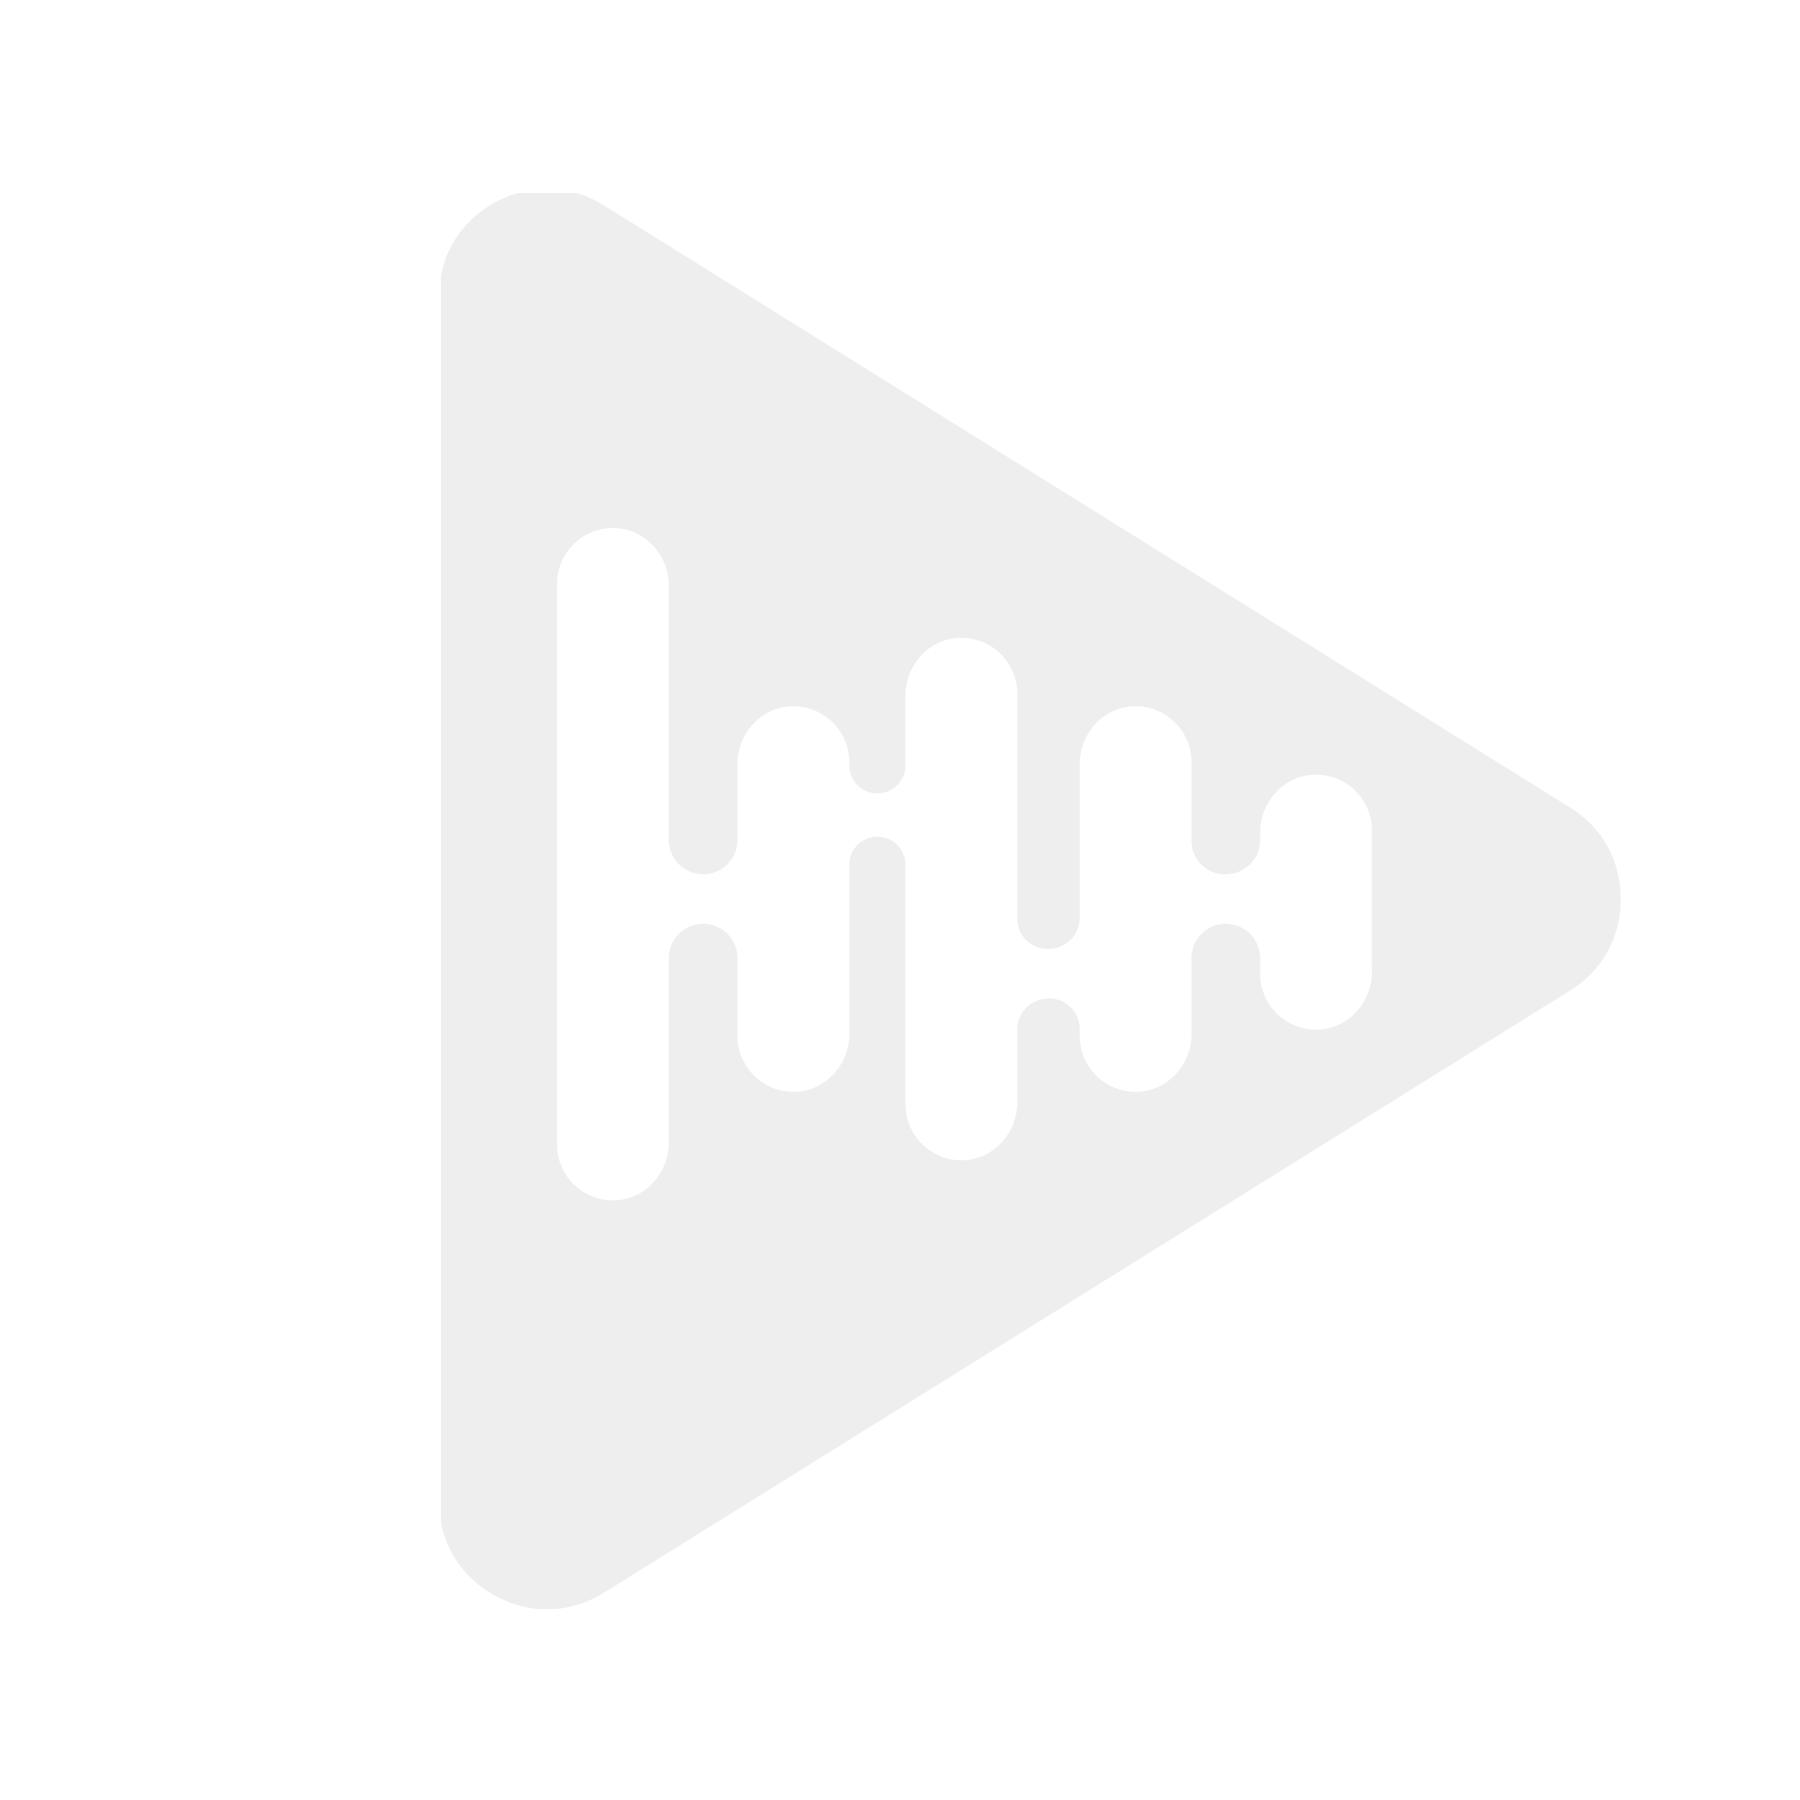 Connect GR00003 - Universal høyttalergrill, 100mm/4